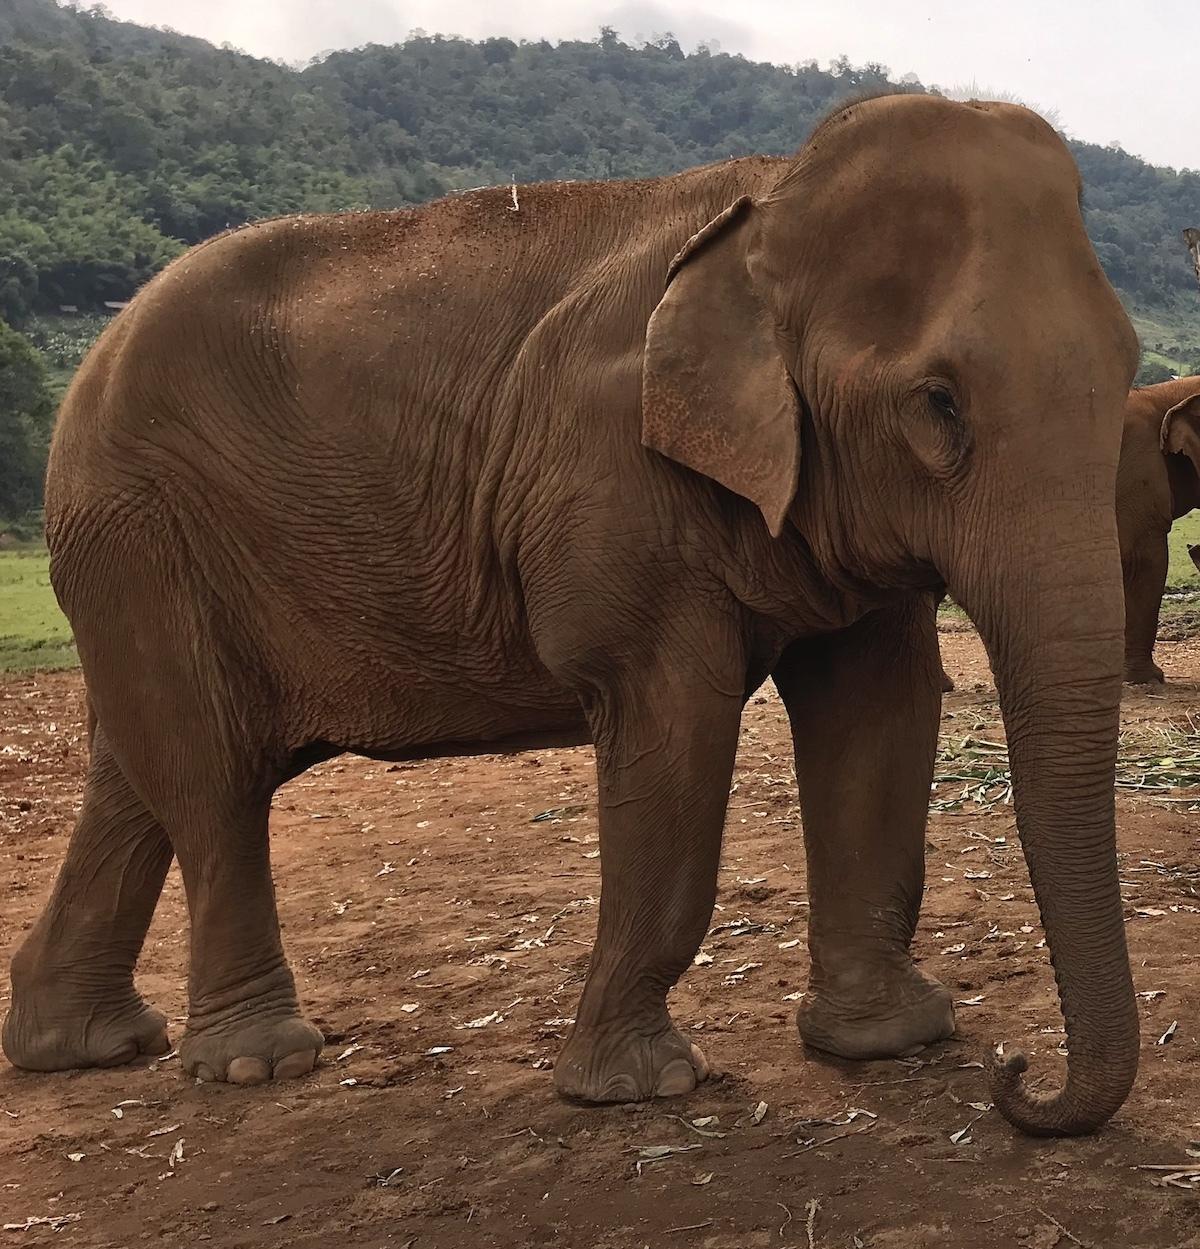 A nearly 100yr old Elephant